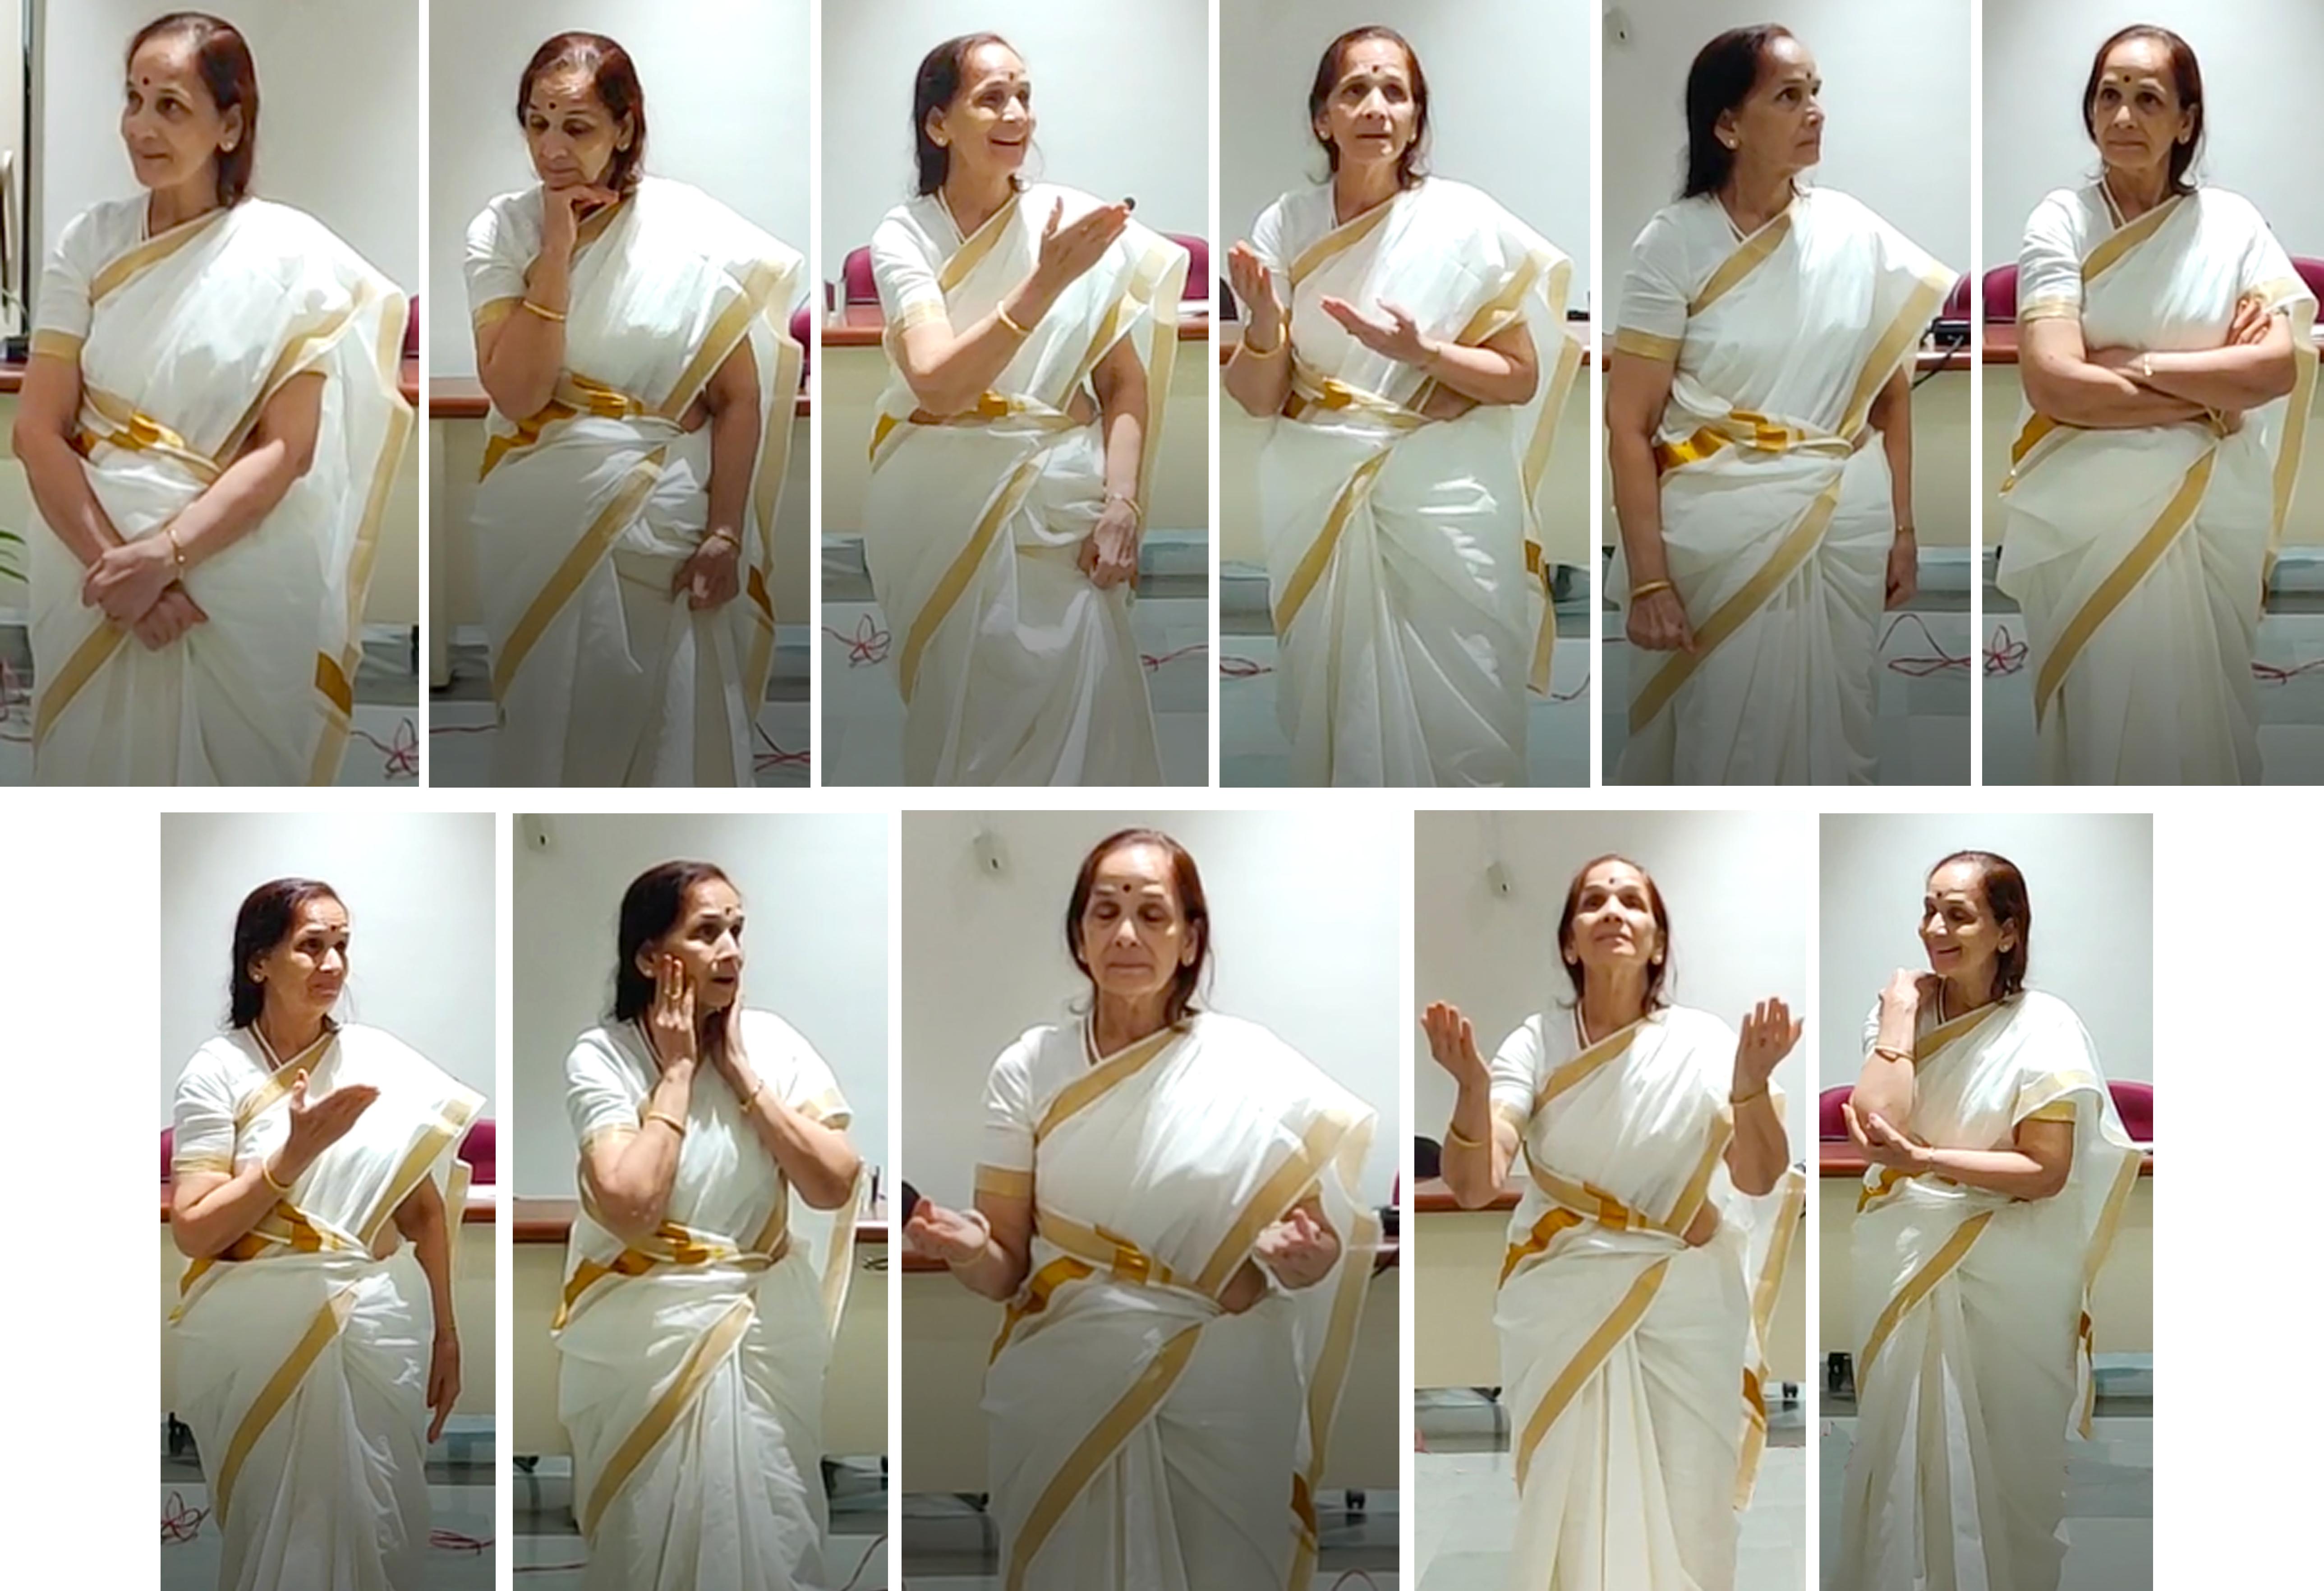 The Expressions of Swaras- Dr. Prem Dave